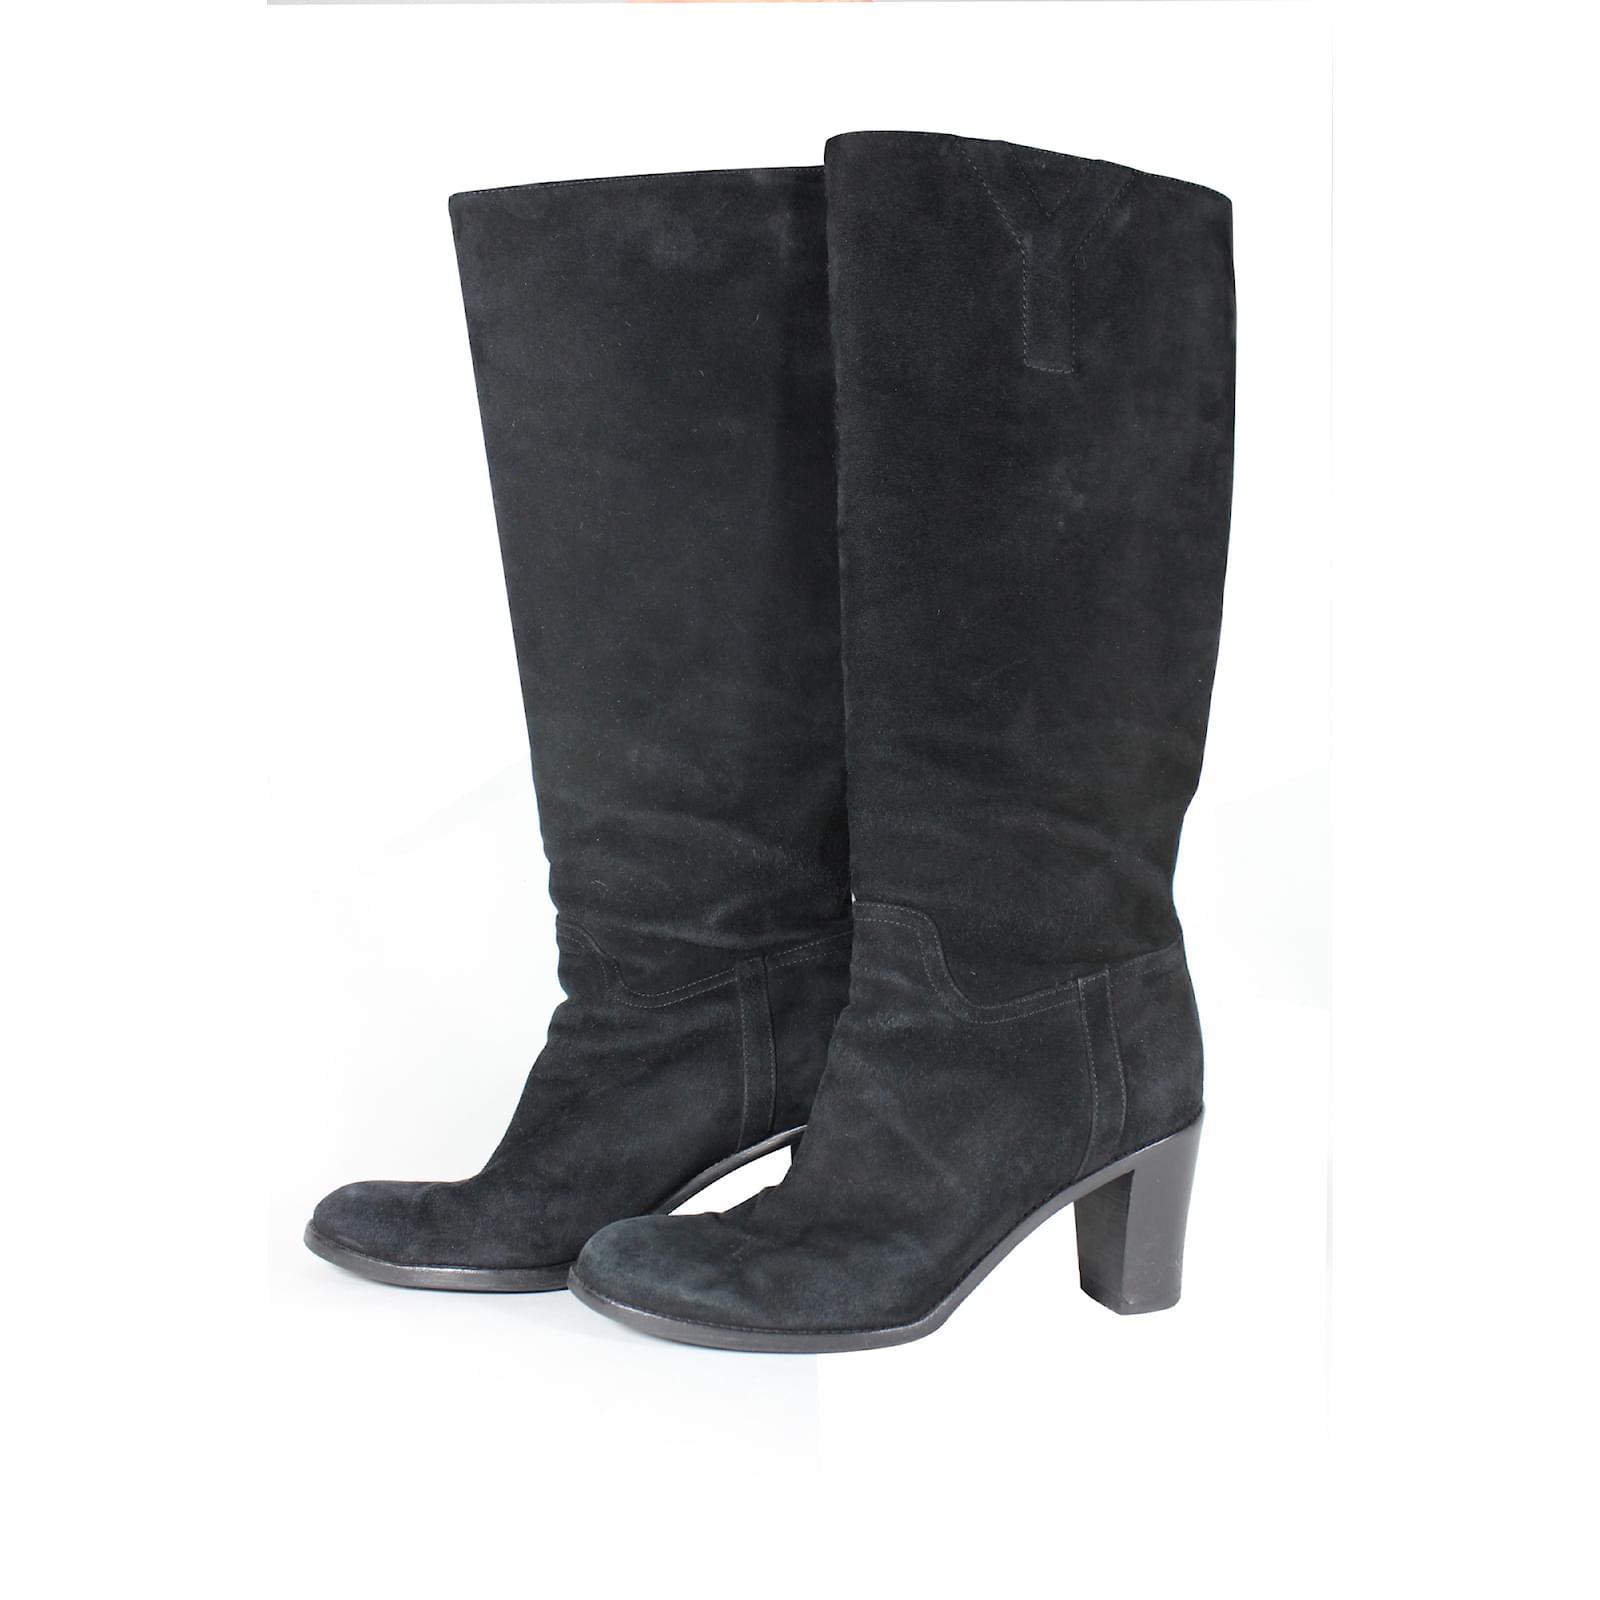 bottes yves saint laurent bottes suede noir. Black Bedroom Furniture Sets. Home Design Ideas